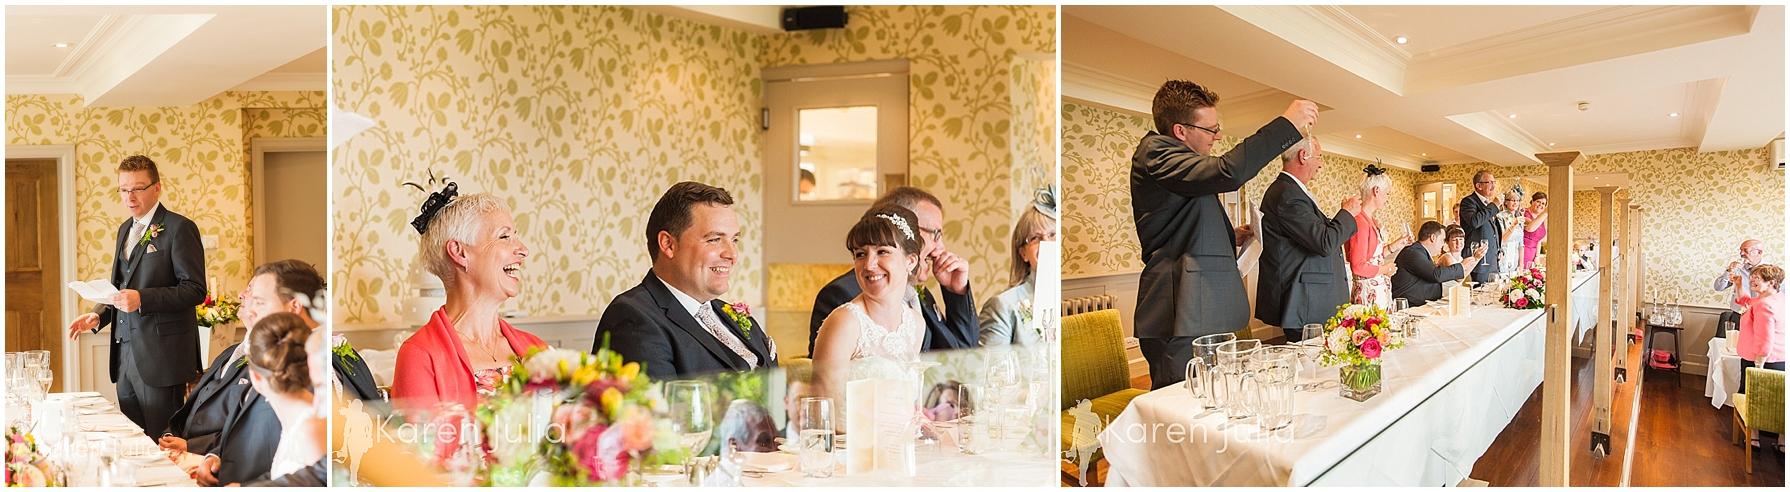 Miller-Howe-Hotel-Summer-Wedding-Photography-20